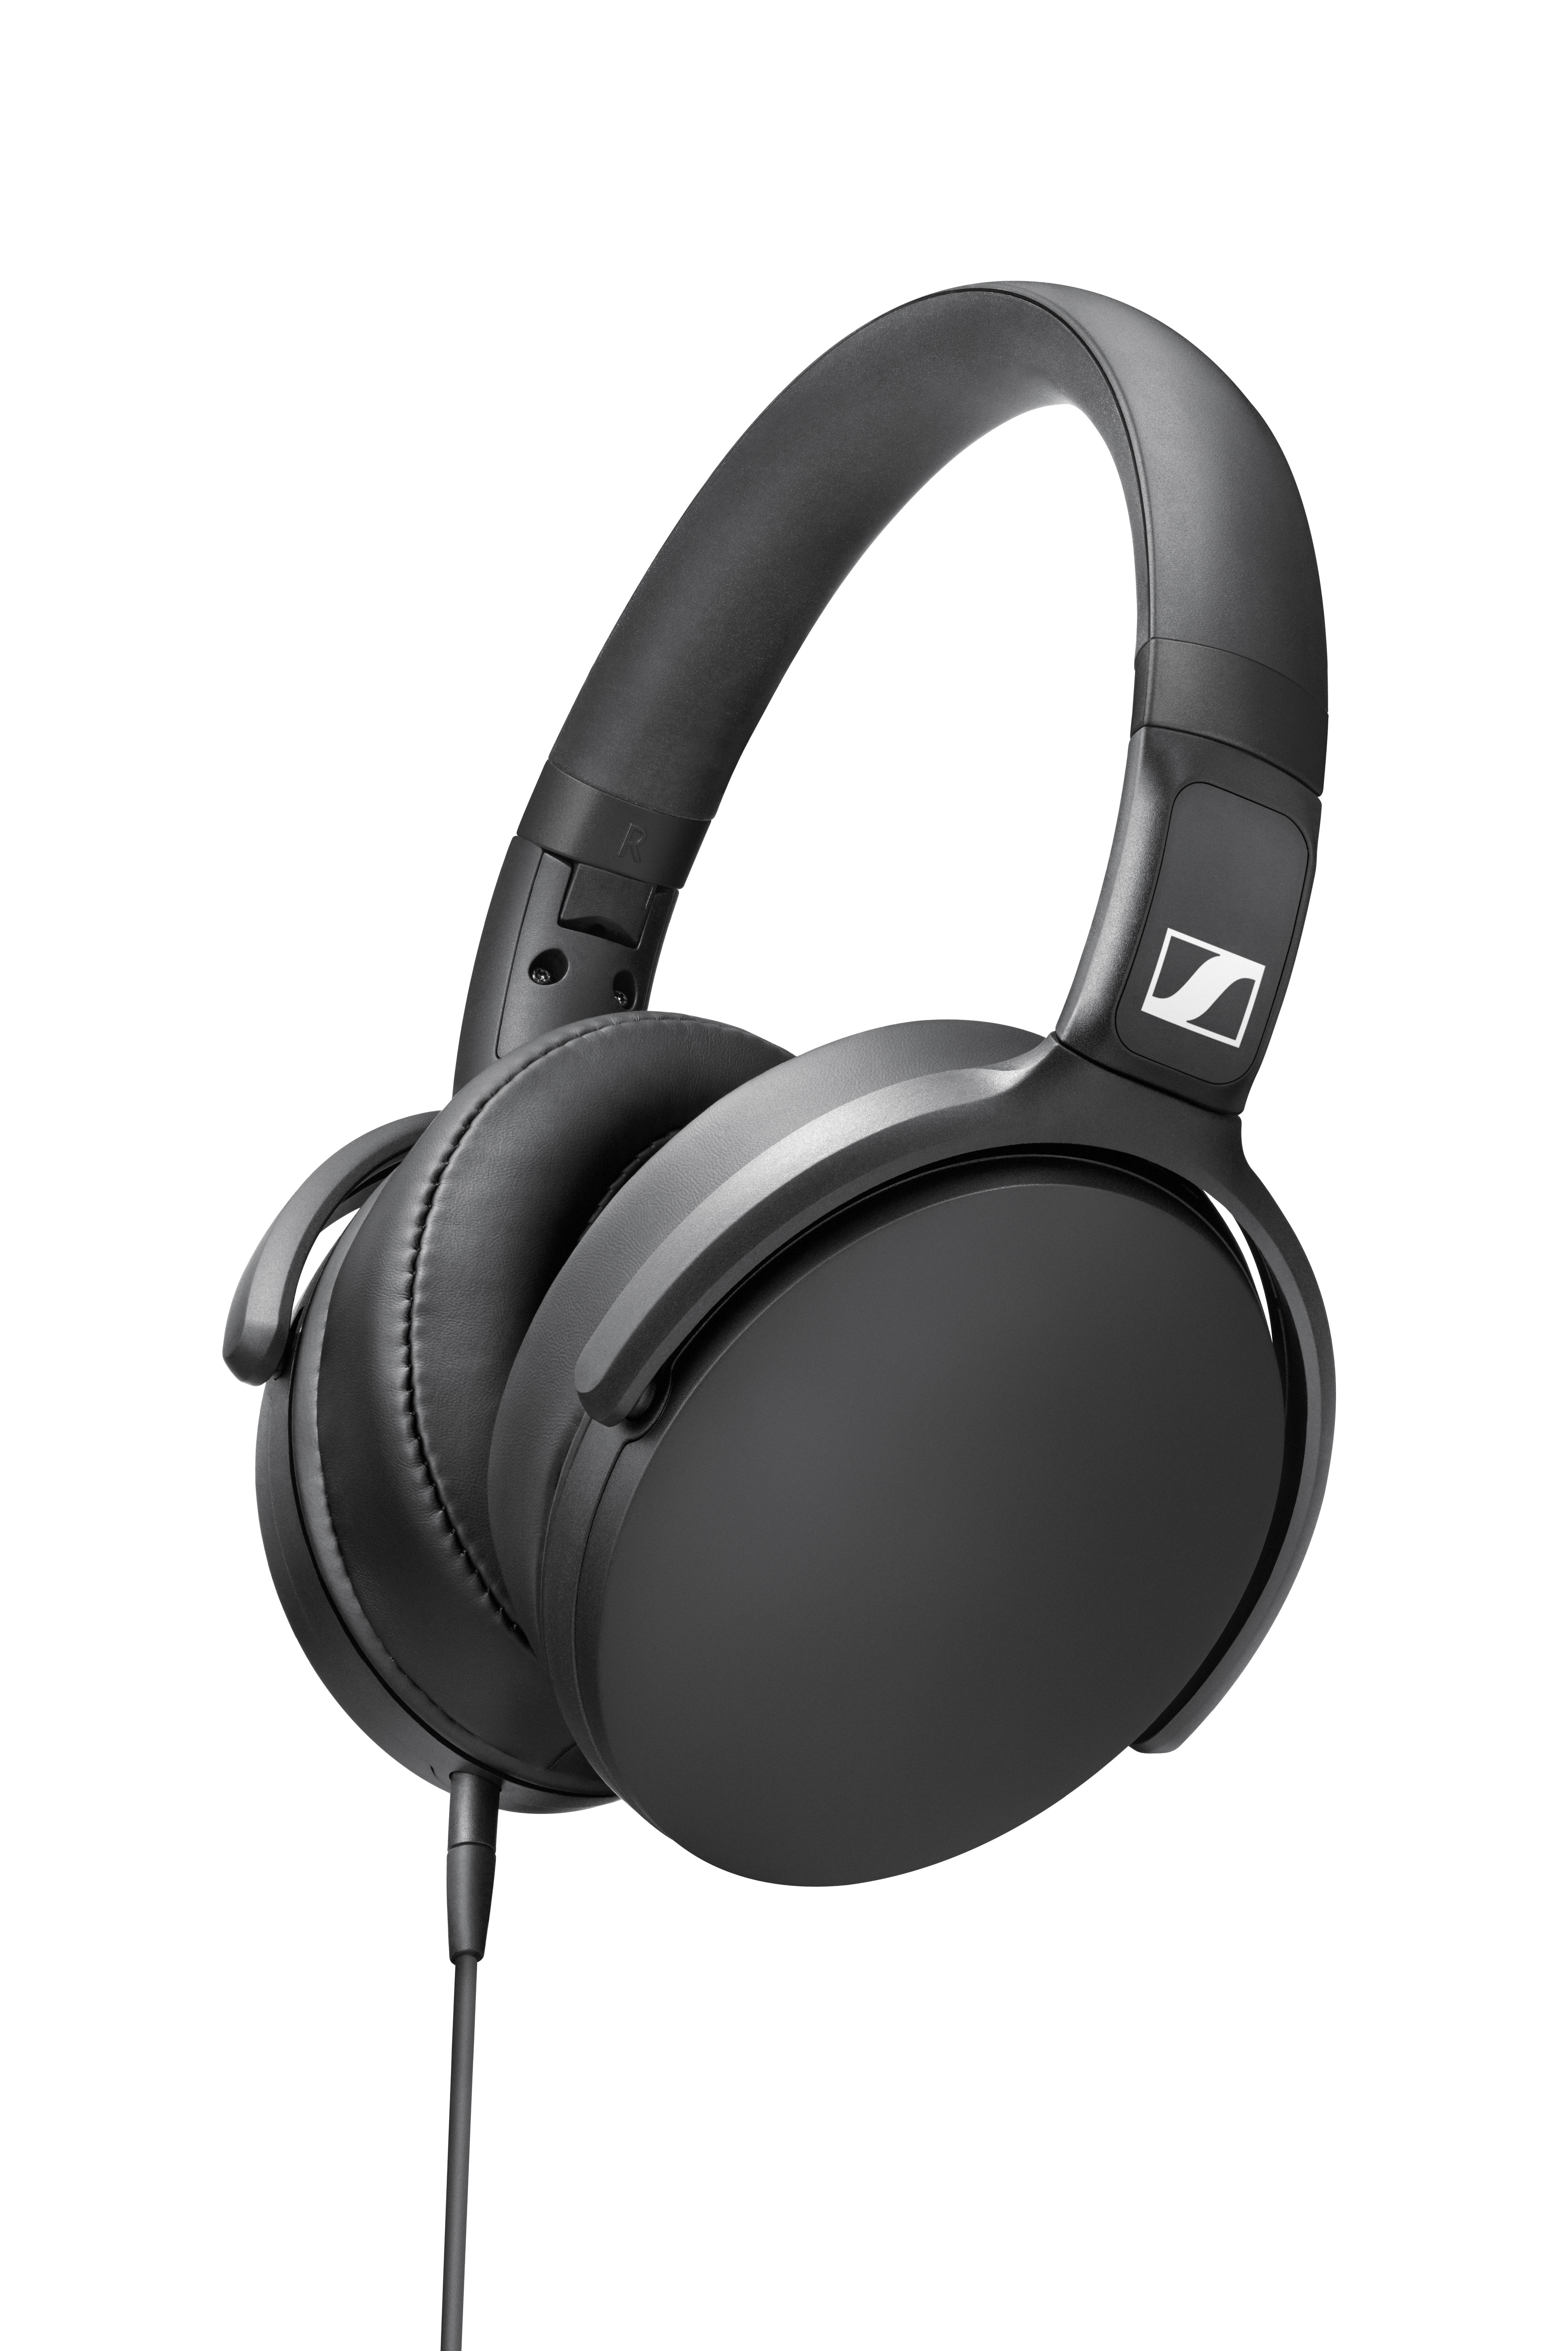 Foto van Sennheiser HD 400s Bluetooth Over-ear hoofdtelefoon